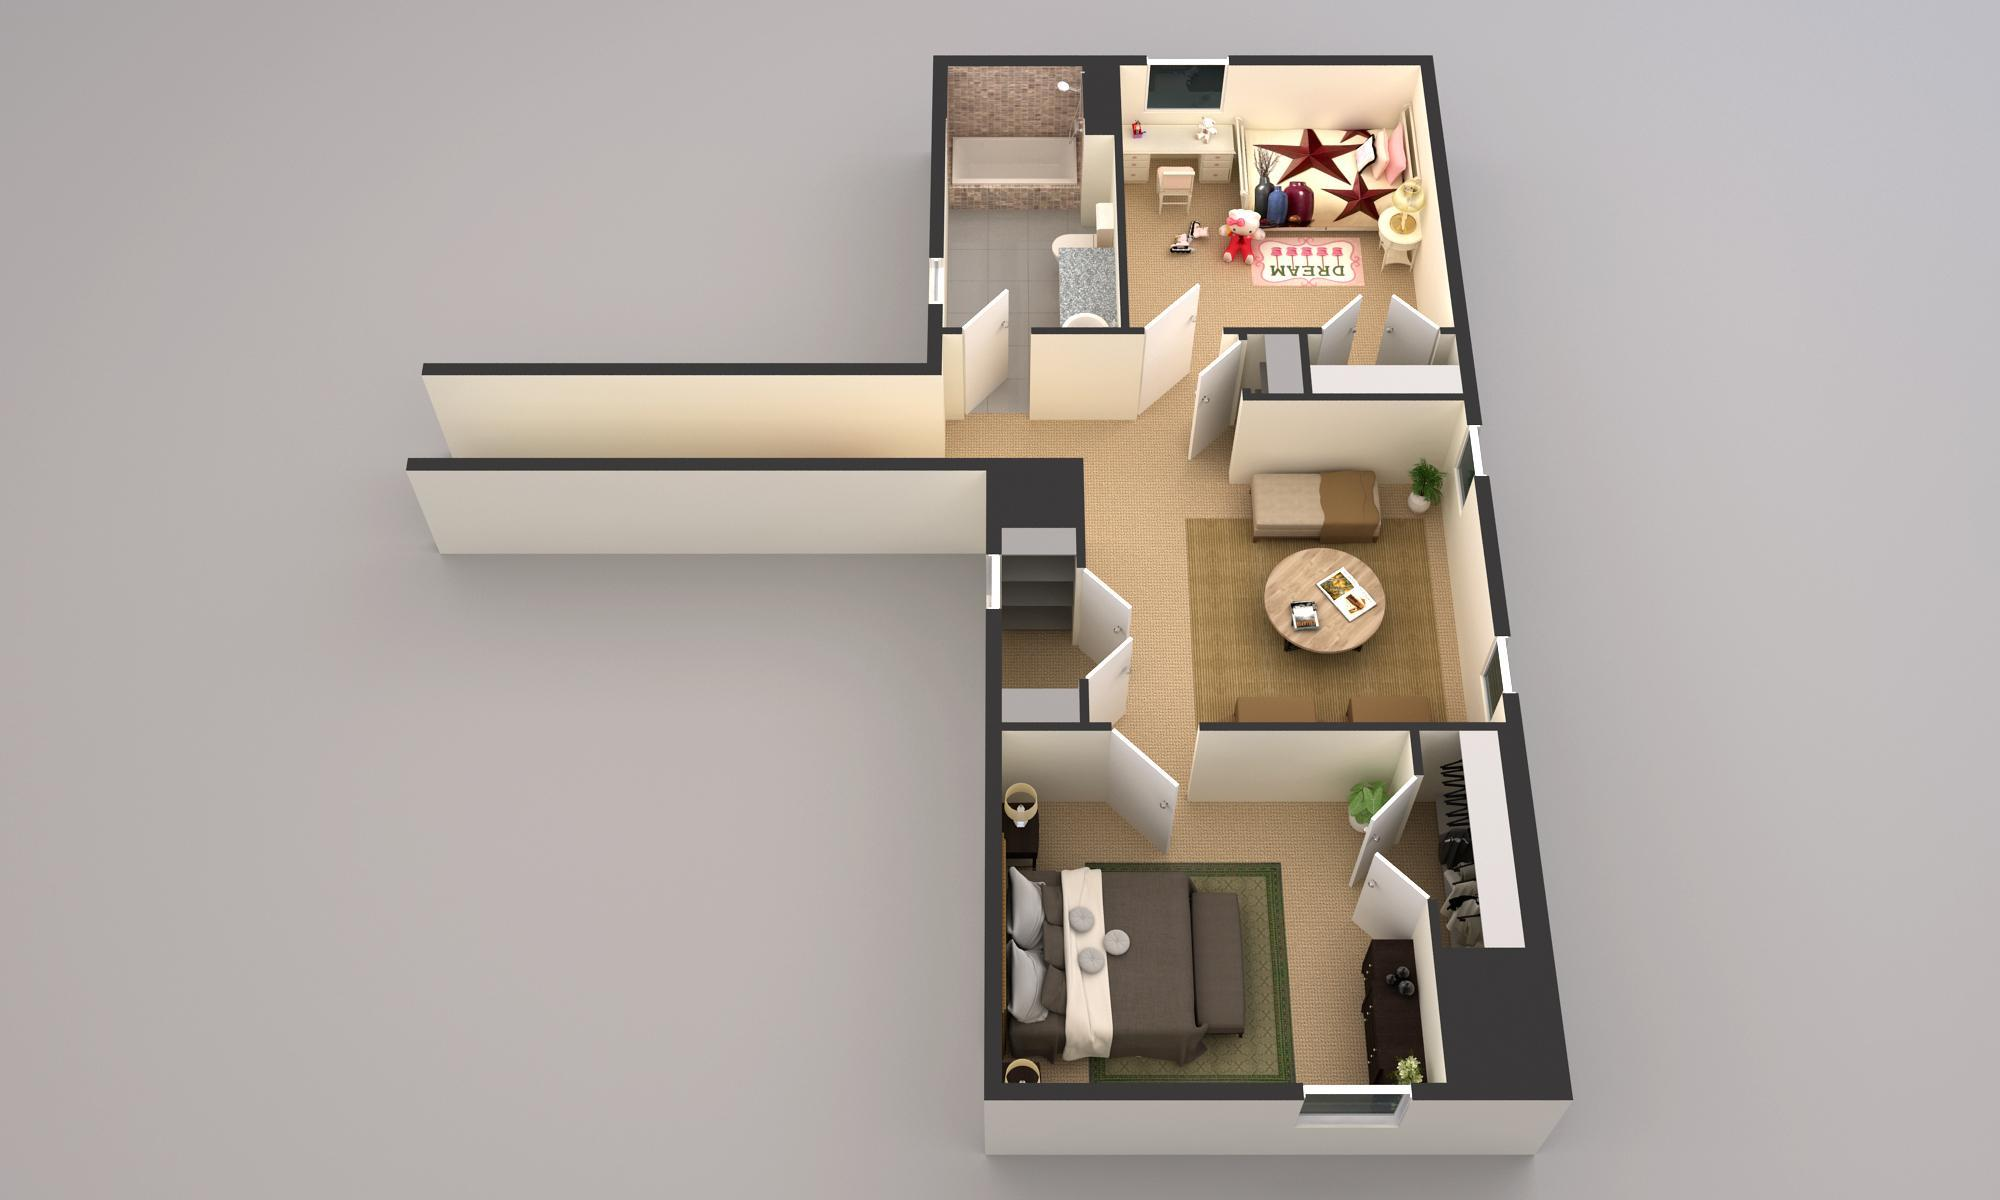 http://partners-dynamic.bdxcdn.com/Images/Homes/GoodallHomebuilder/max1500_27738859-181114.jpg